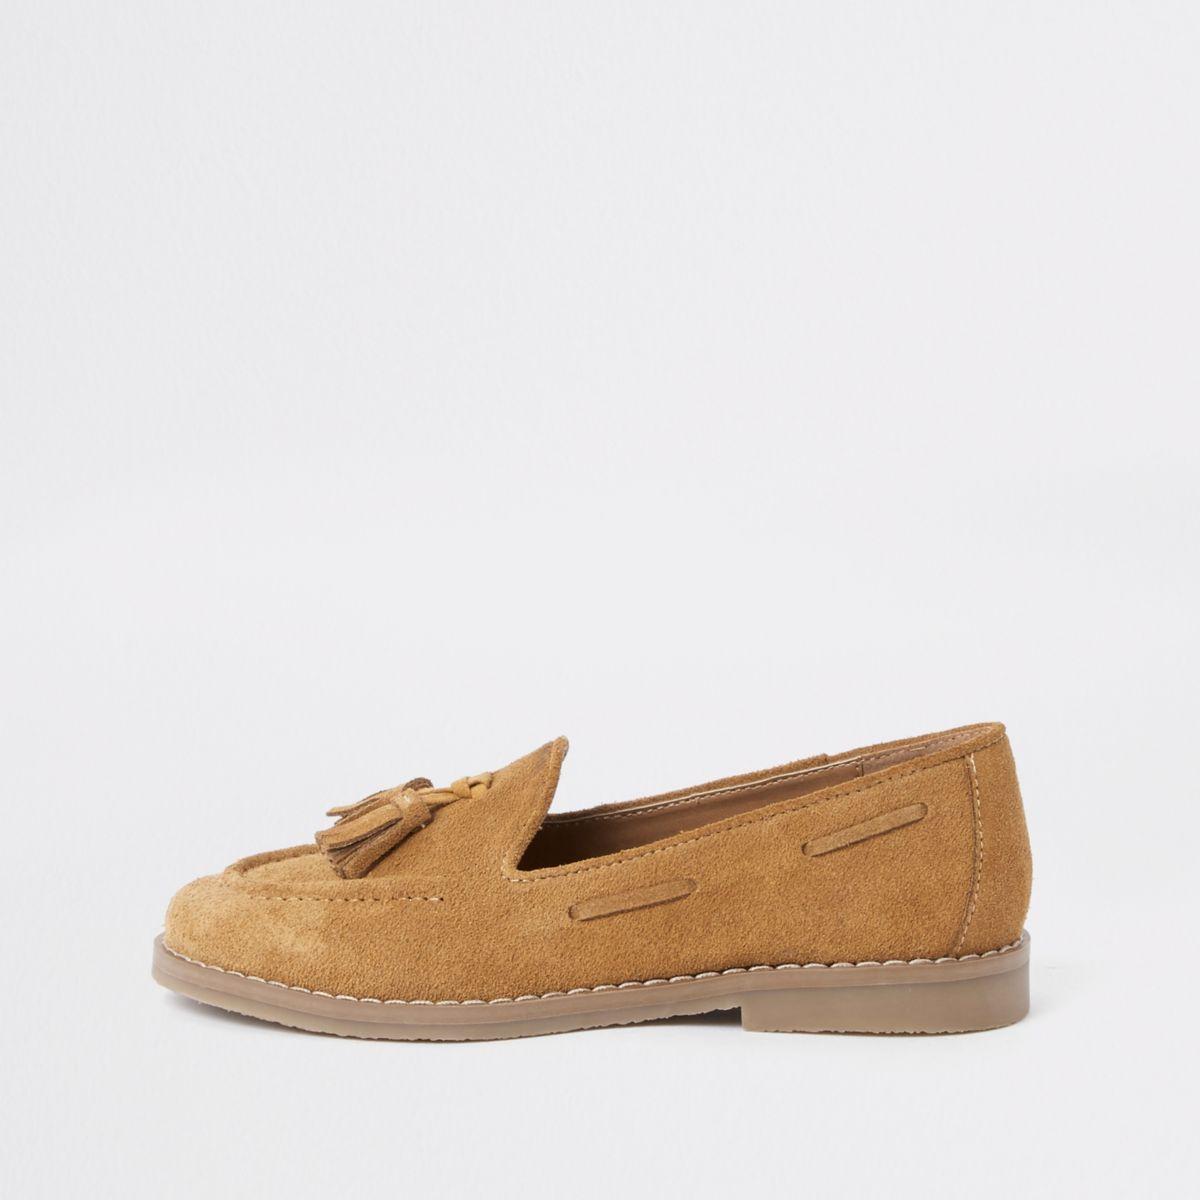 Boys light brown tassel loafers